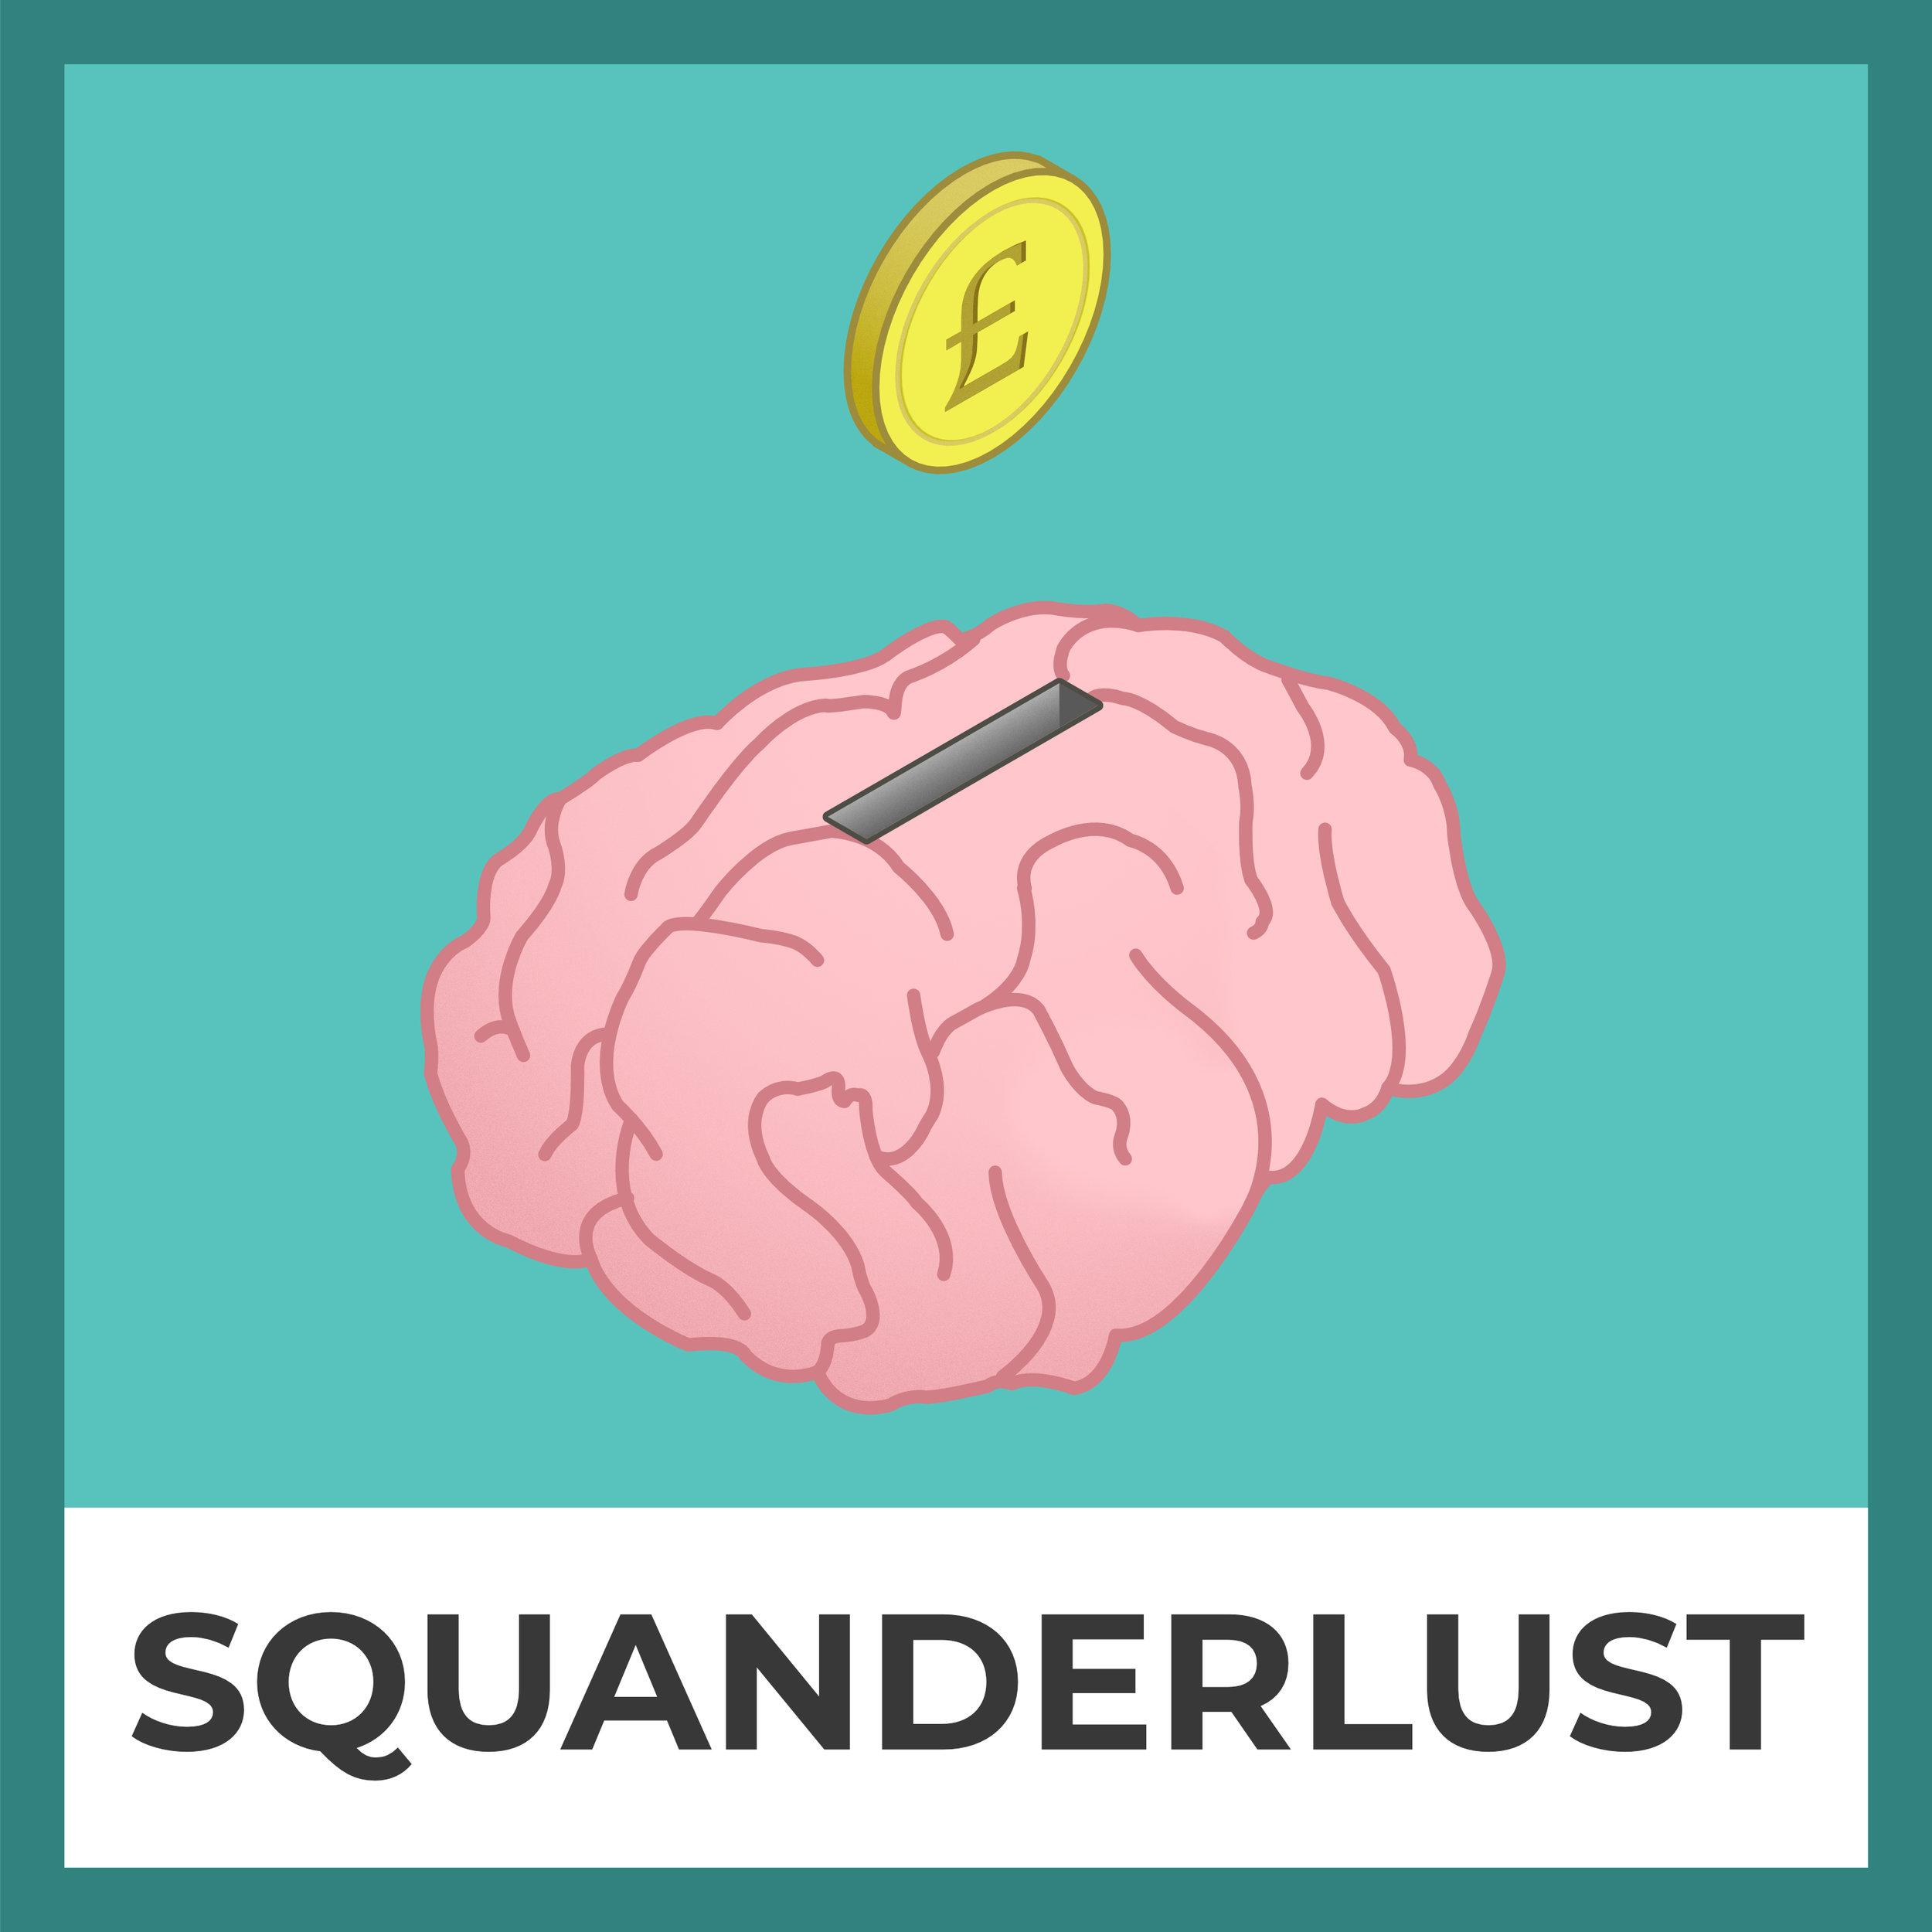 Squanderlust JPEG logo 3 (3000 x 3000px).jpg